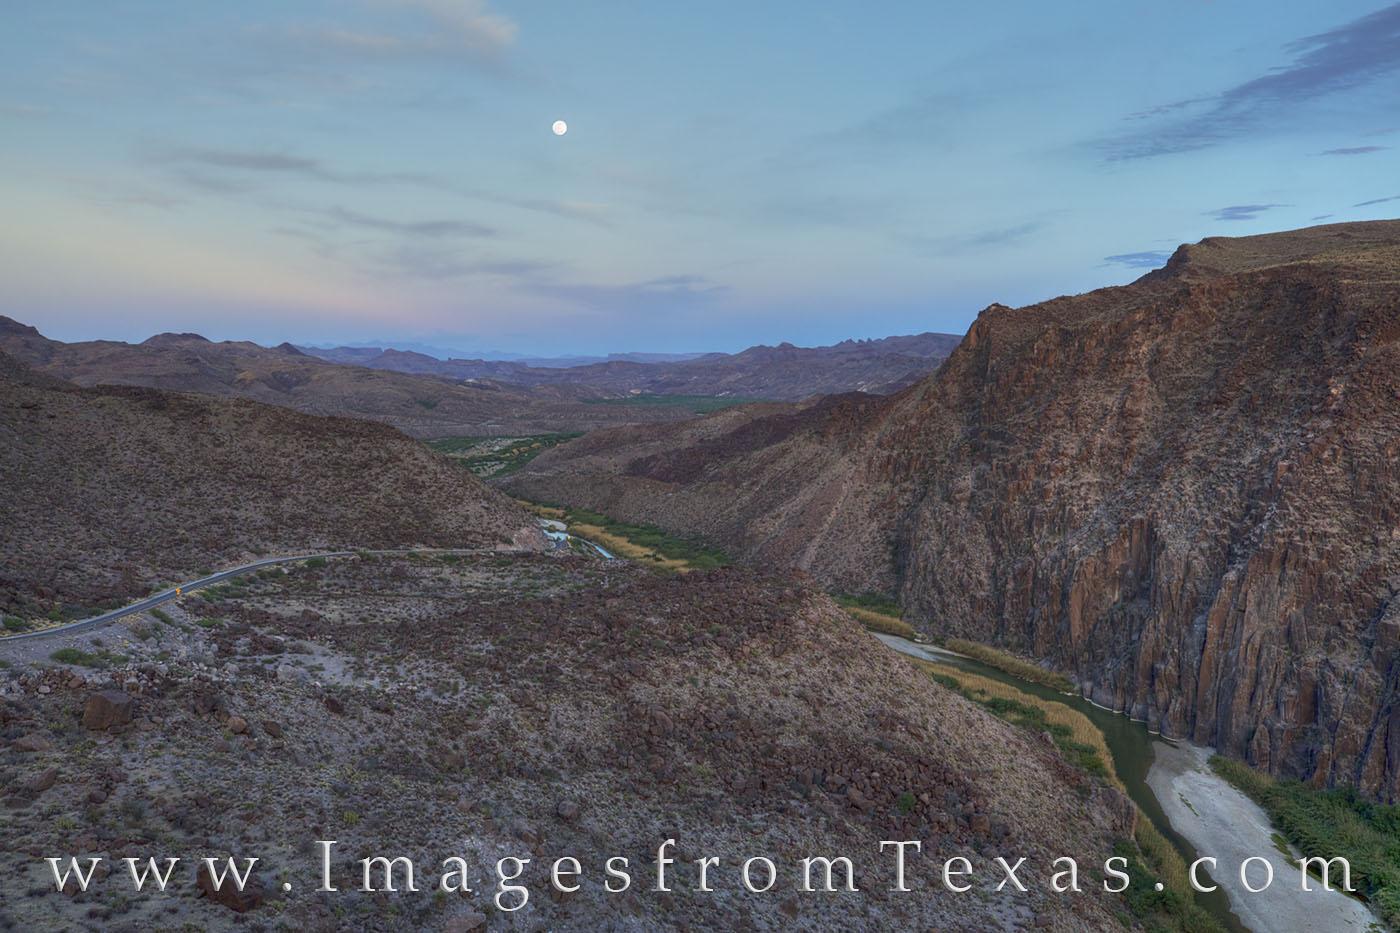 big bend ranch state park, moonrise, rio grande, dom hill, big hill, texas border, texas landscapes, big bend, FM 170, lajitas, photo